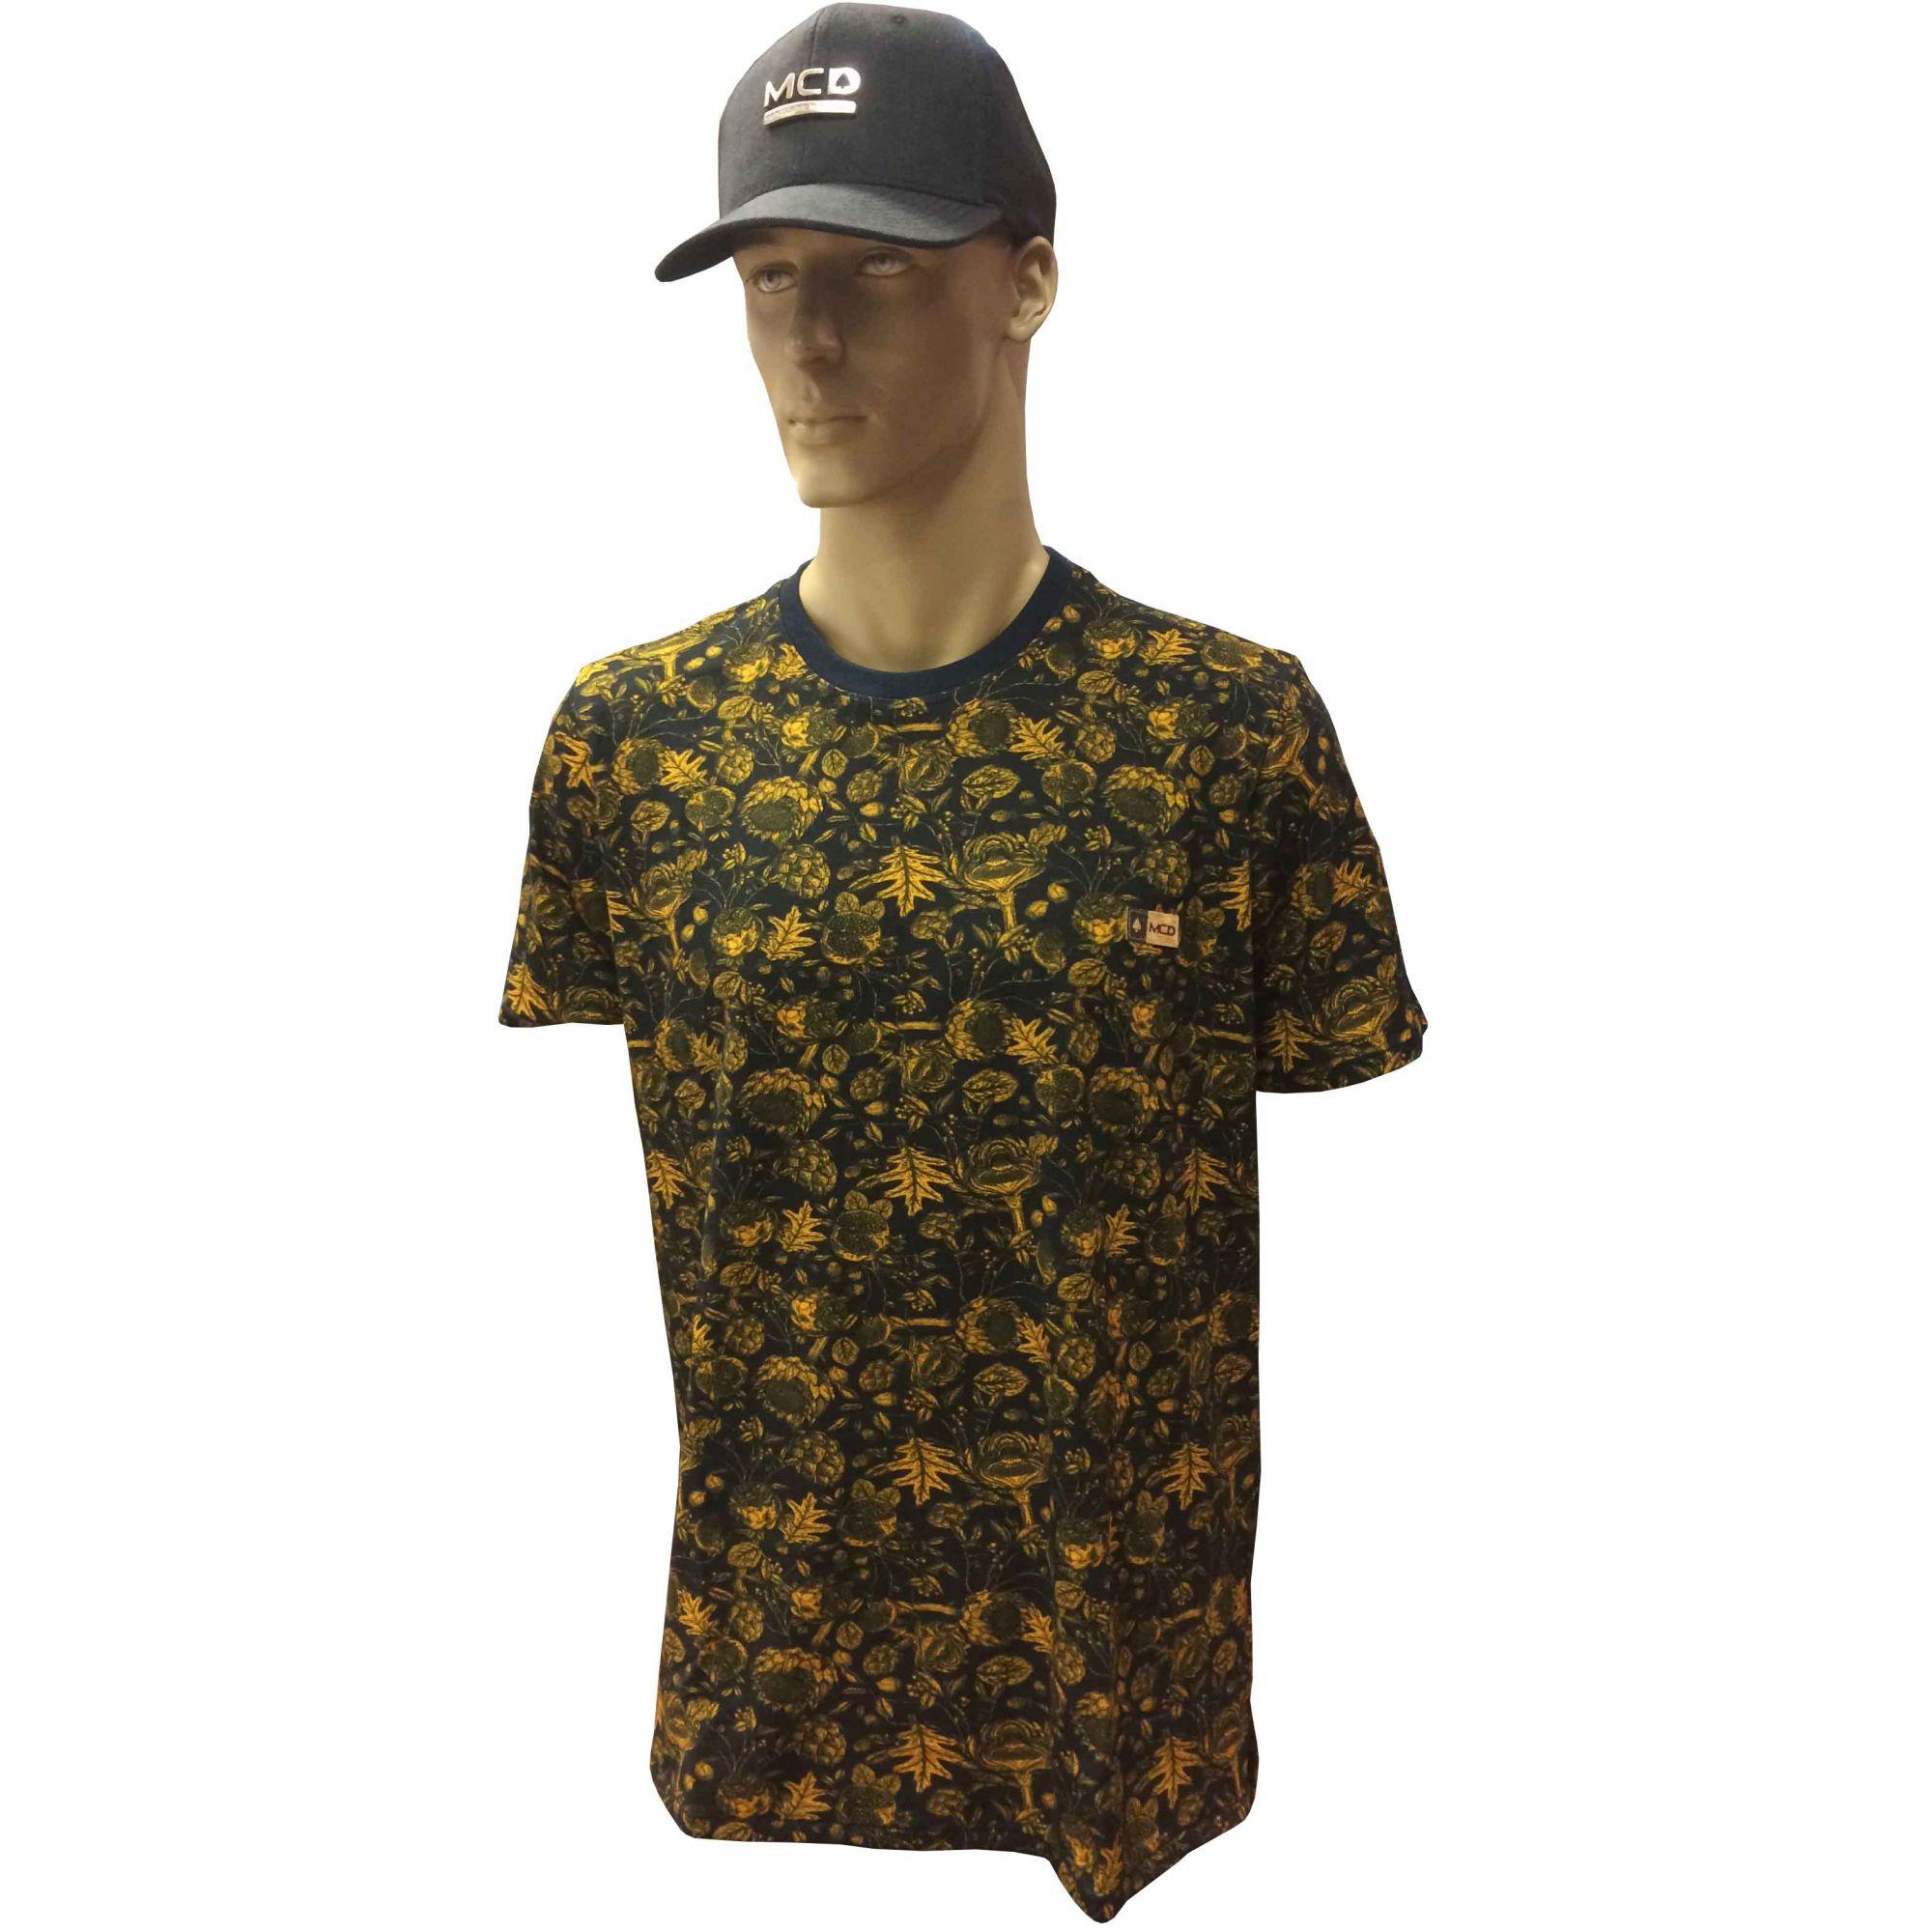 Camiseta Mcd 11912013 Masculina